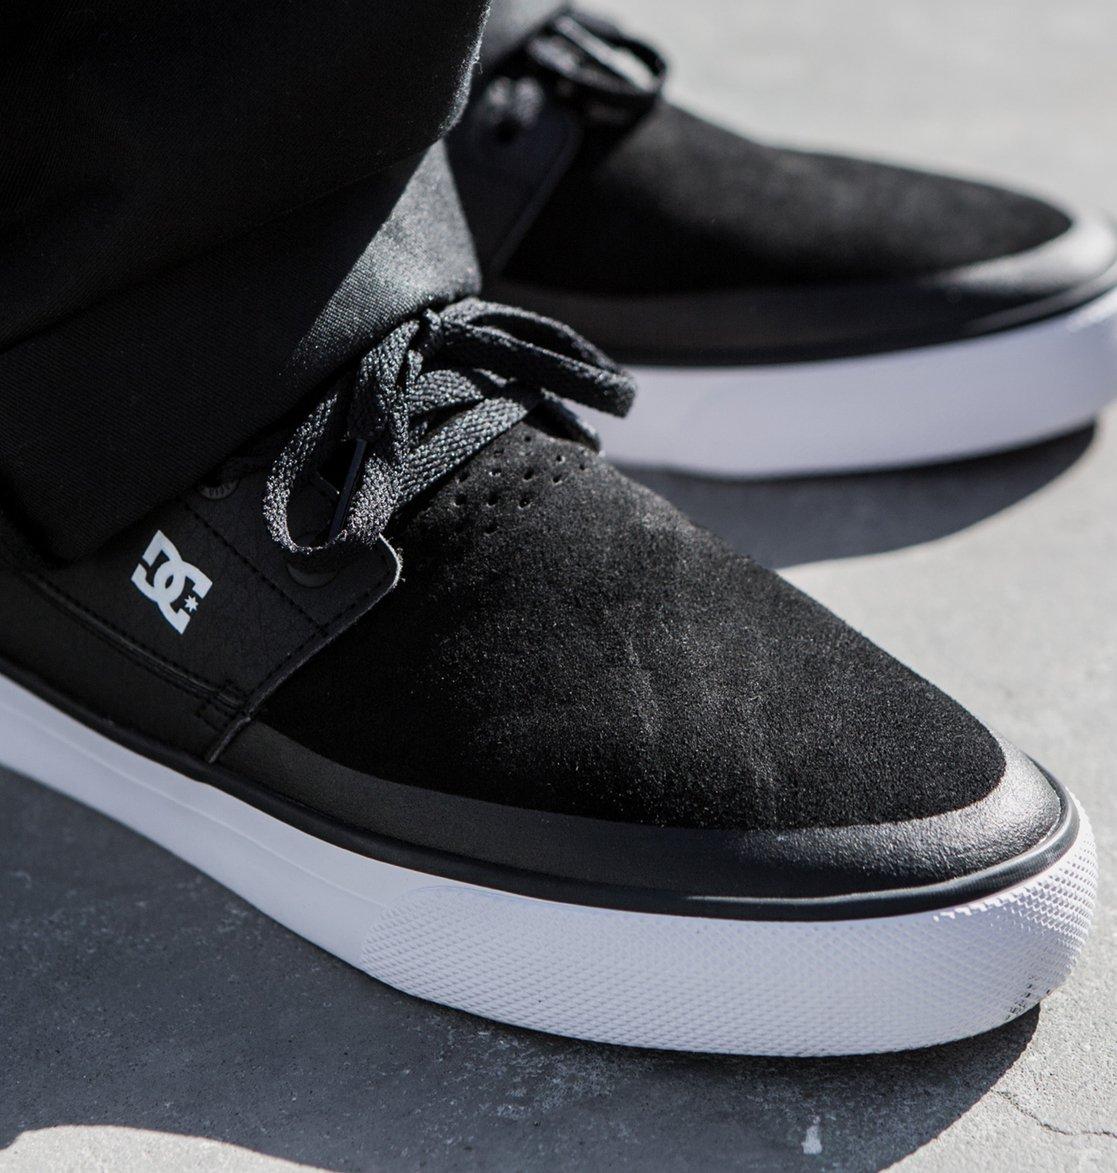 sports shoes 0eac8 a709b Wes Kremer 2 S - Zapatillas de skate para Hombre